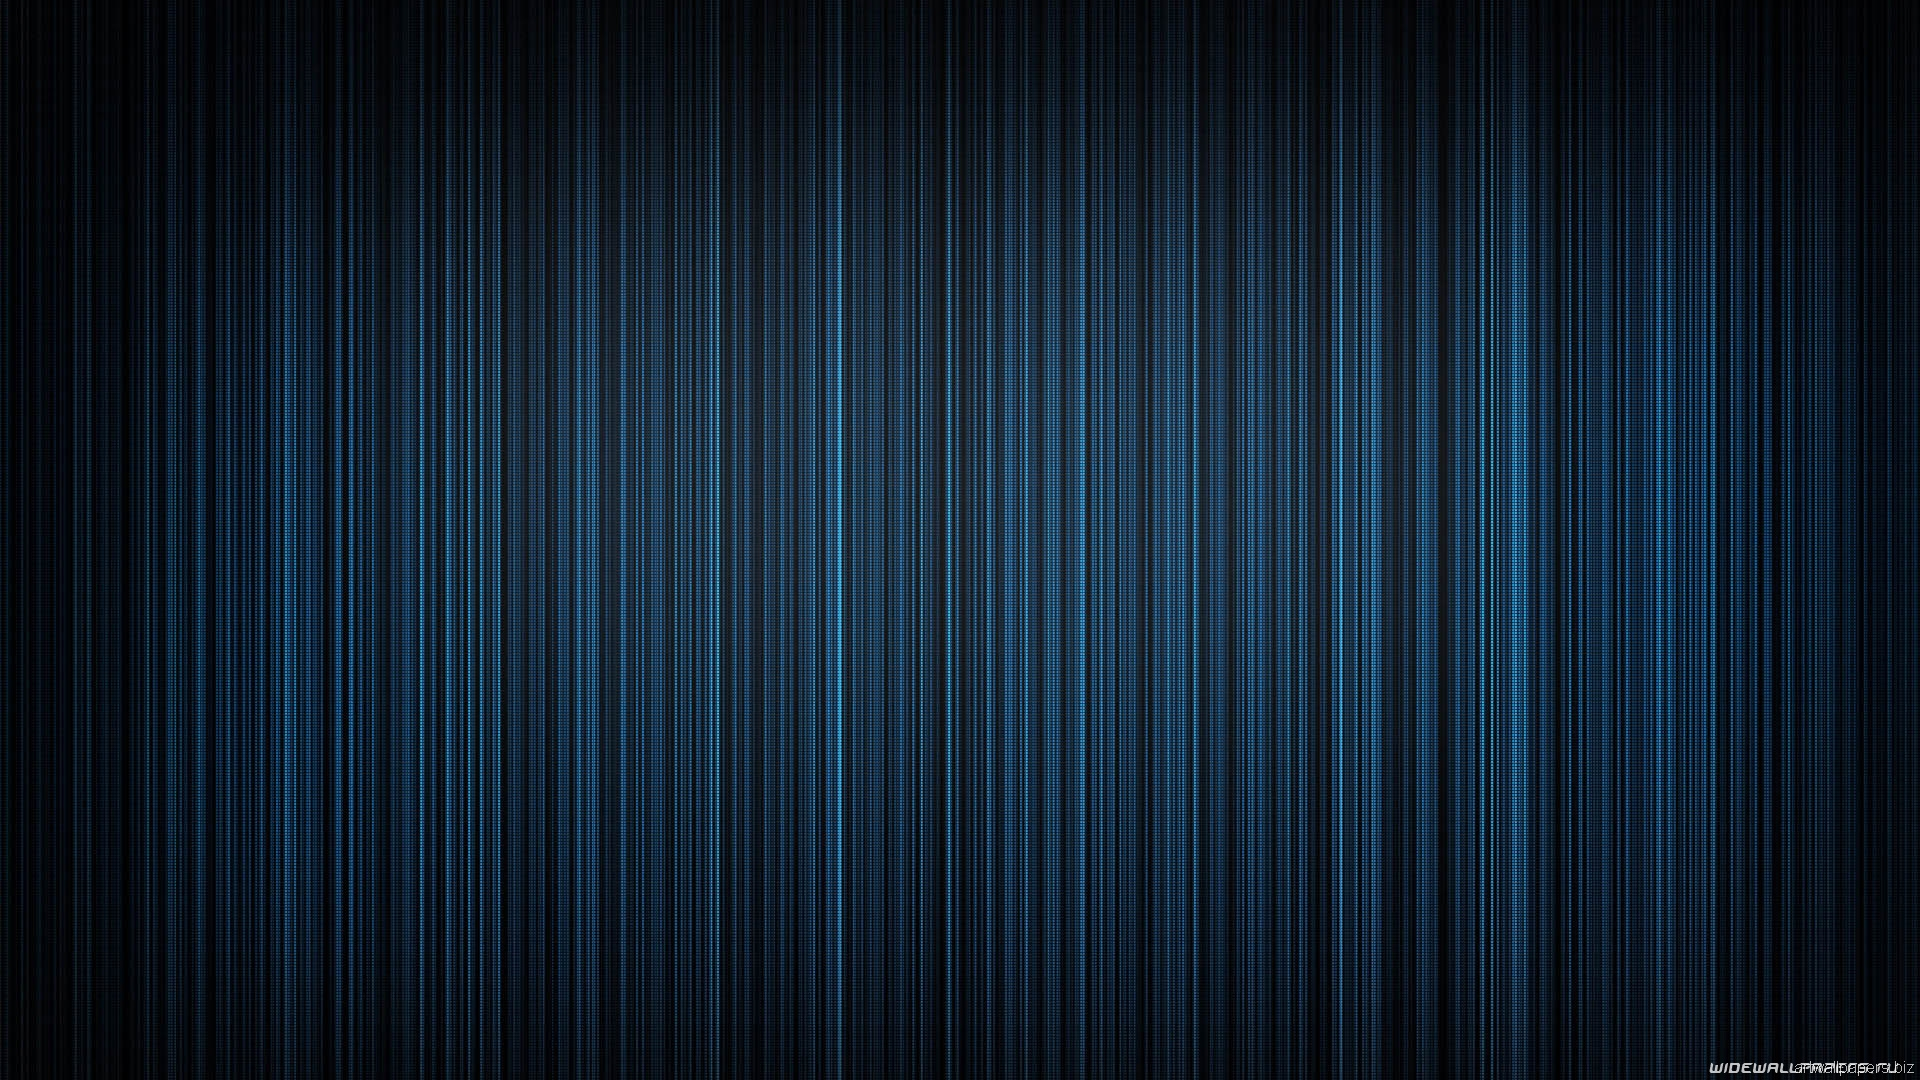 Laptop Abstract Wallpapers Desktop Backgrounds Hd 1920x1080